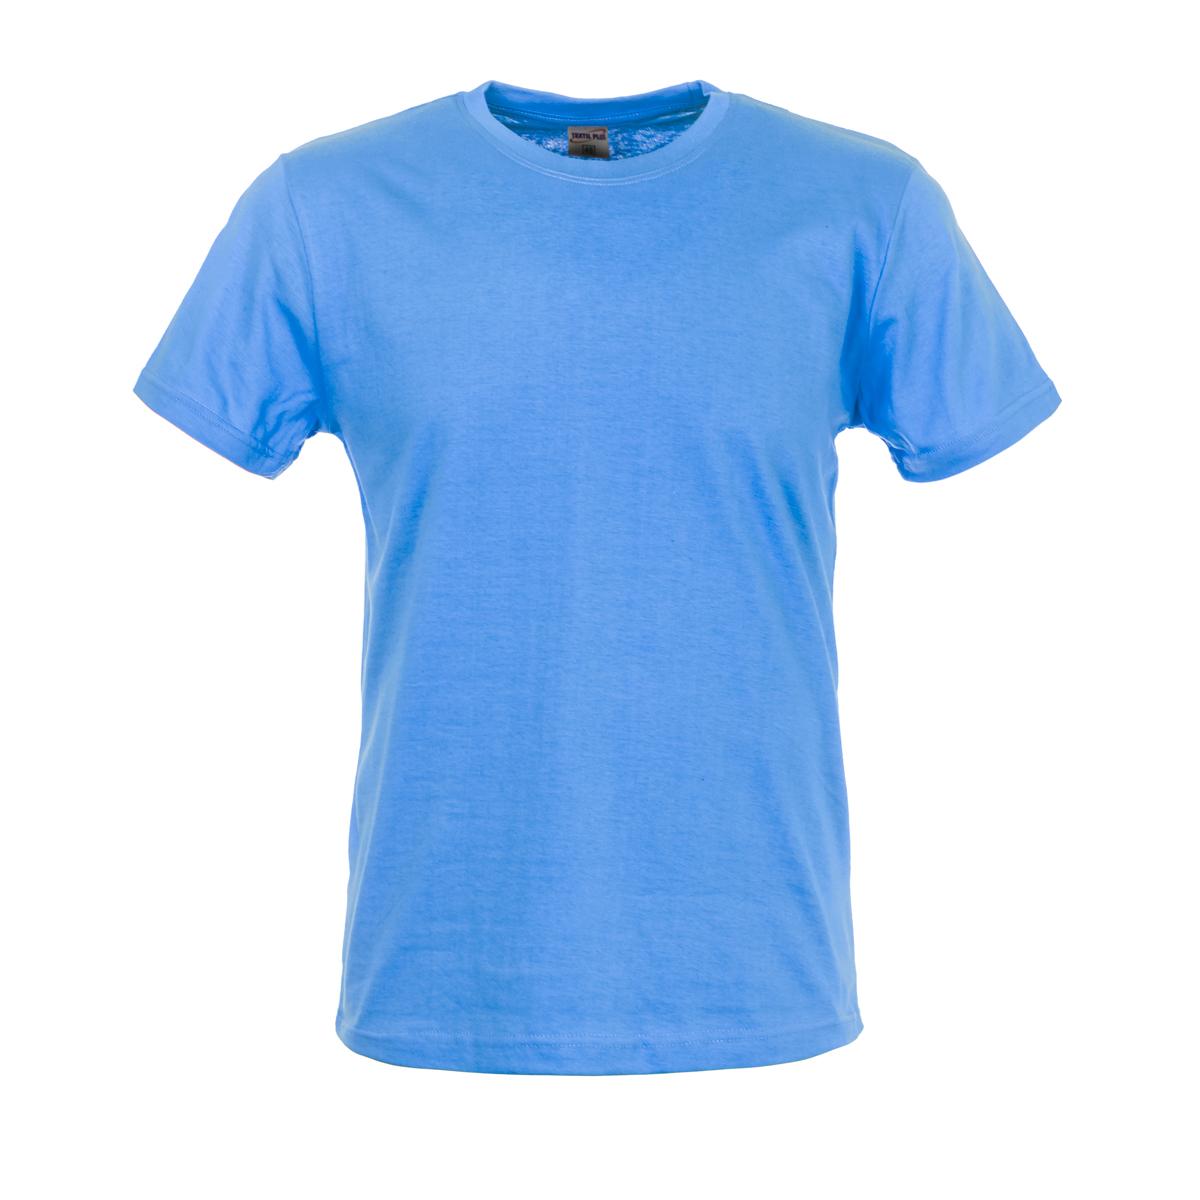 Муж. футболка арт. 04-0062 р. 48Майки и футболки<br>Фактический ОГ: 96 см <br>Фактический ОТ: 94 см <br>Фактический ОБ: 94 см <br>Длина по спинке: 66 см <br>Рост: 178-188 см<br><br>Тип: Муж. футболка<br>Размер: 48<br>Материал: Кулирка